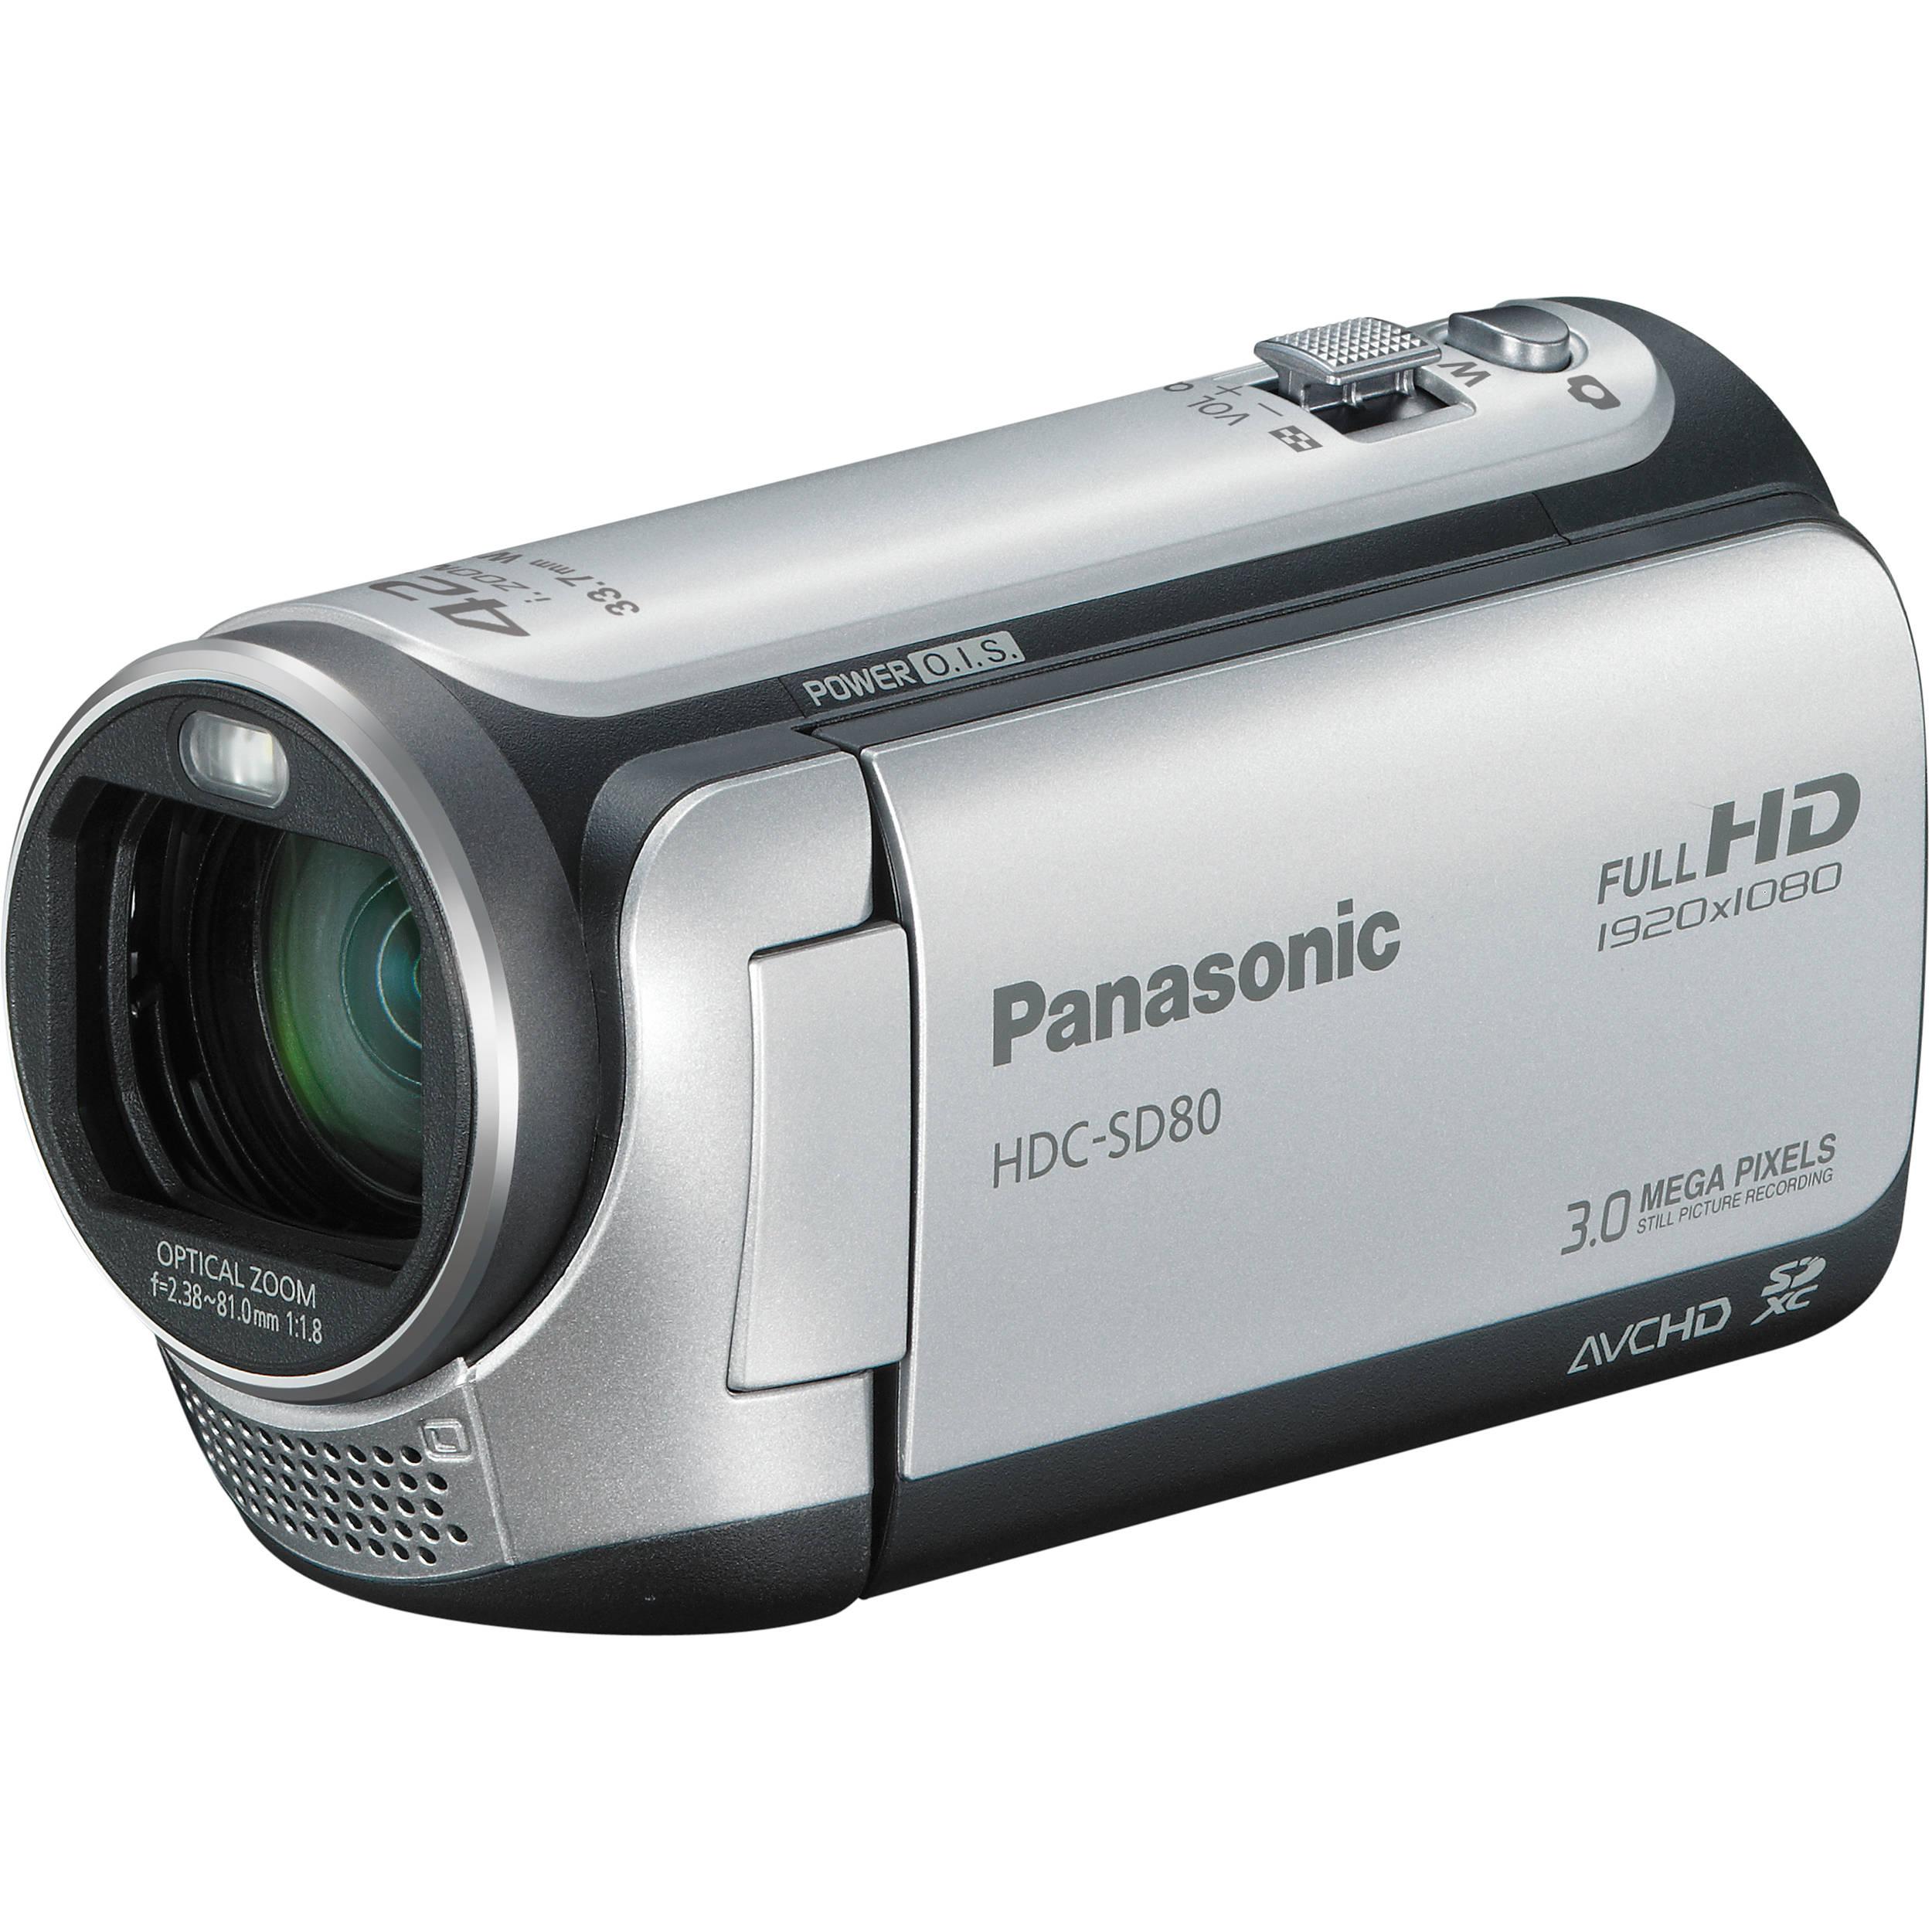 Panasonic HDC-SD80 High Definition Camcorder (Silver)